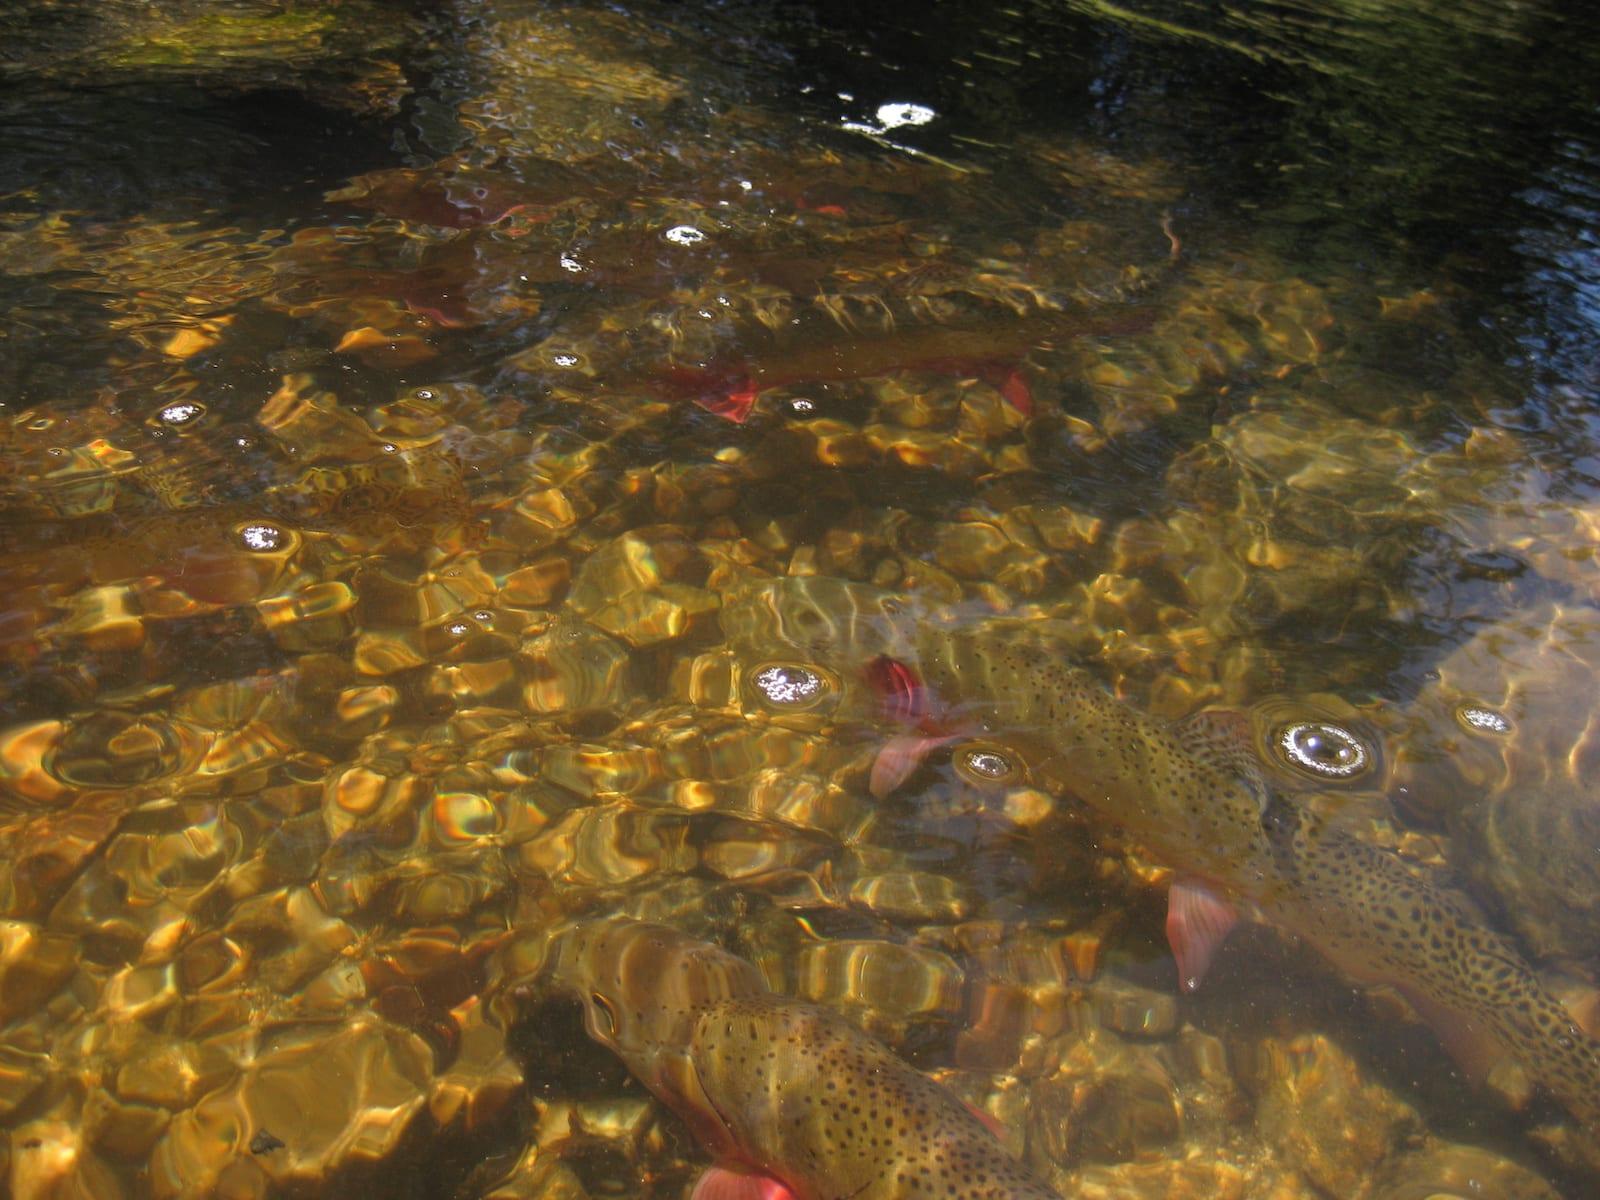 Colorado Greenback Cutthroat Trouts in Remote Mountain Creek